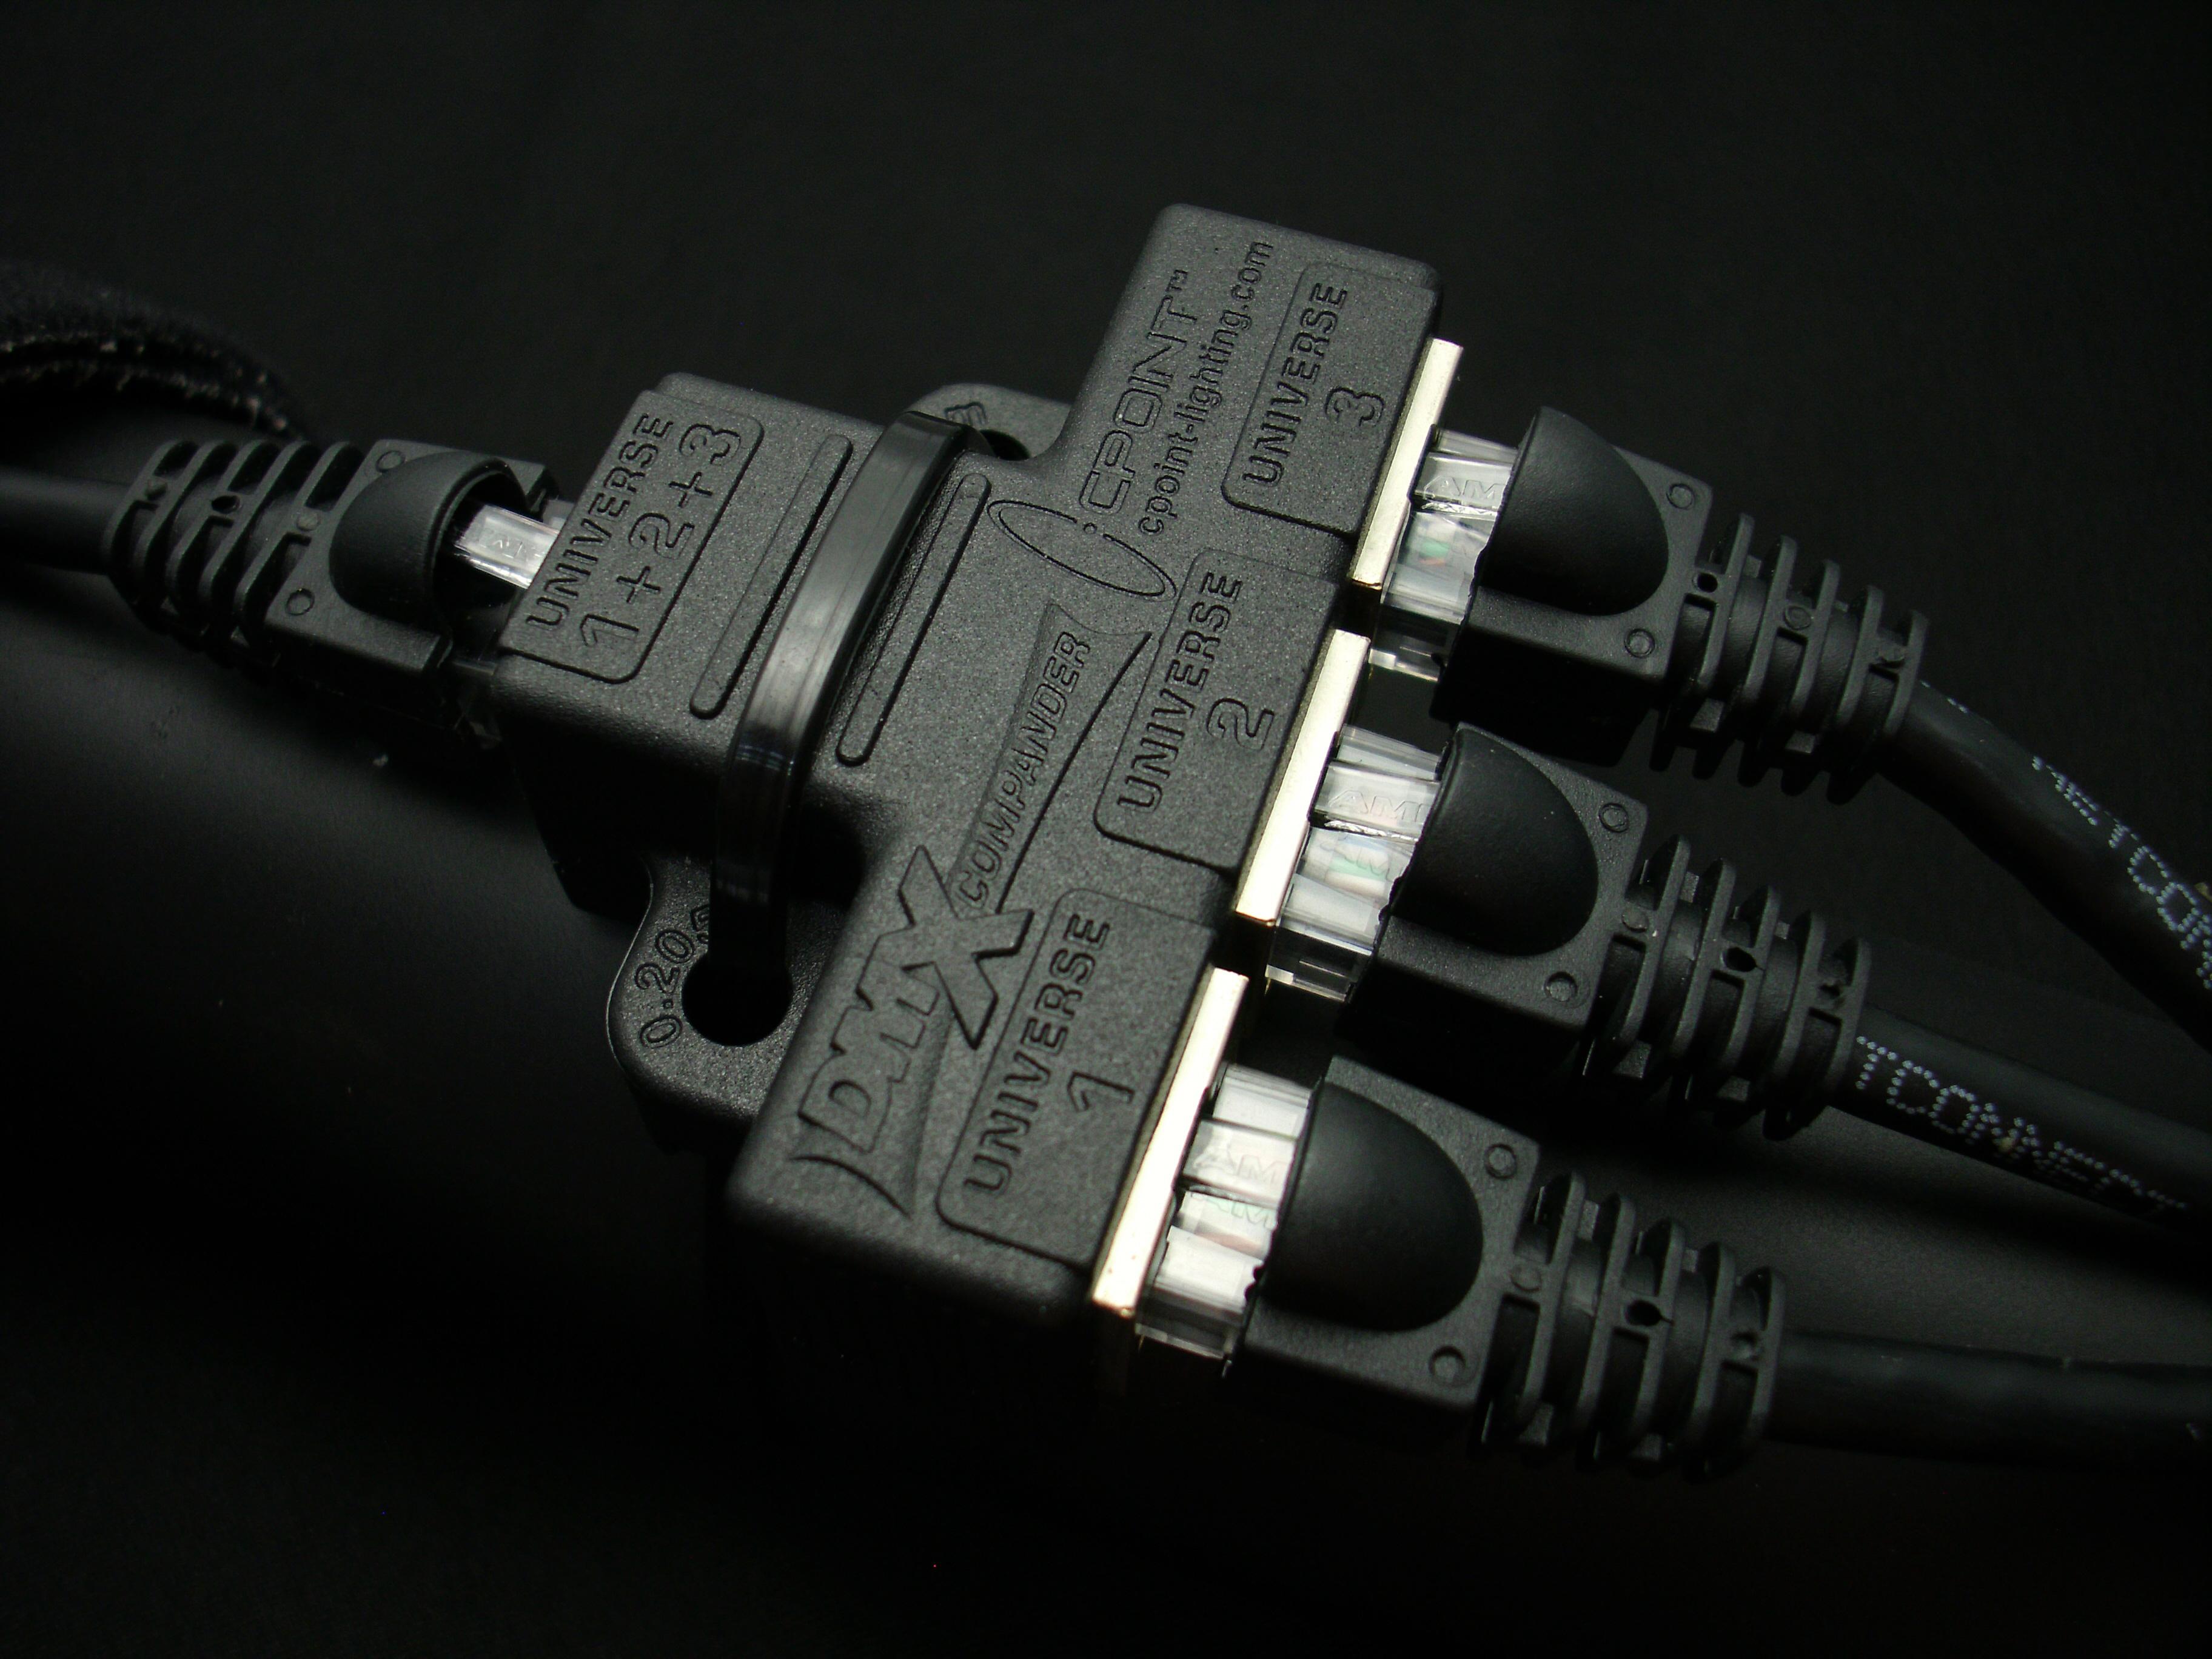 Tecnec Dmxcomp Rj45 Dmx Compander Three Dmx12 Universes Over 1 Cat5 Cat 5 Wiring Diagram On Nti Cable